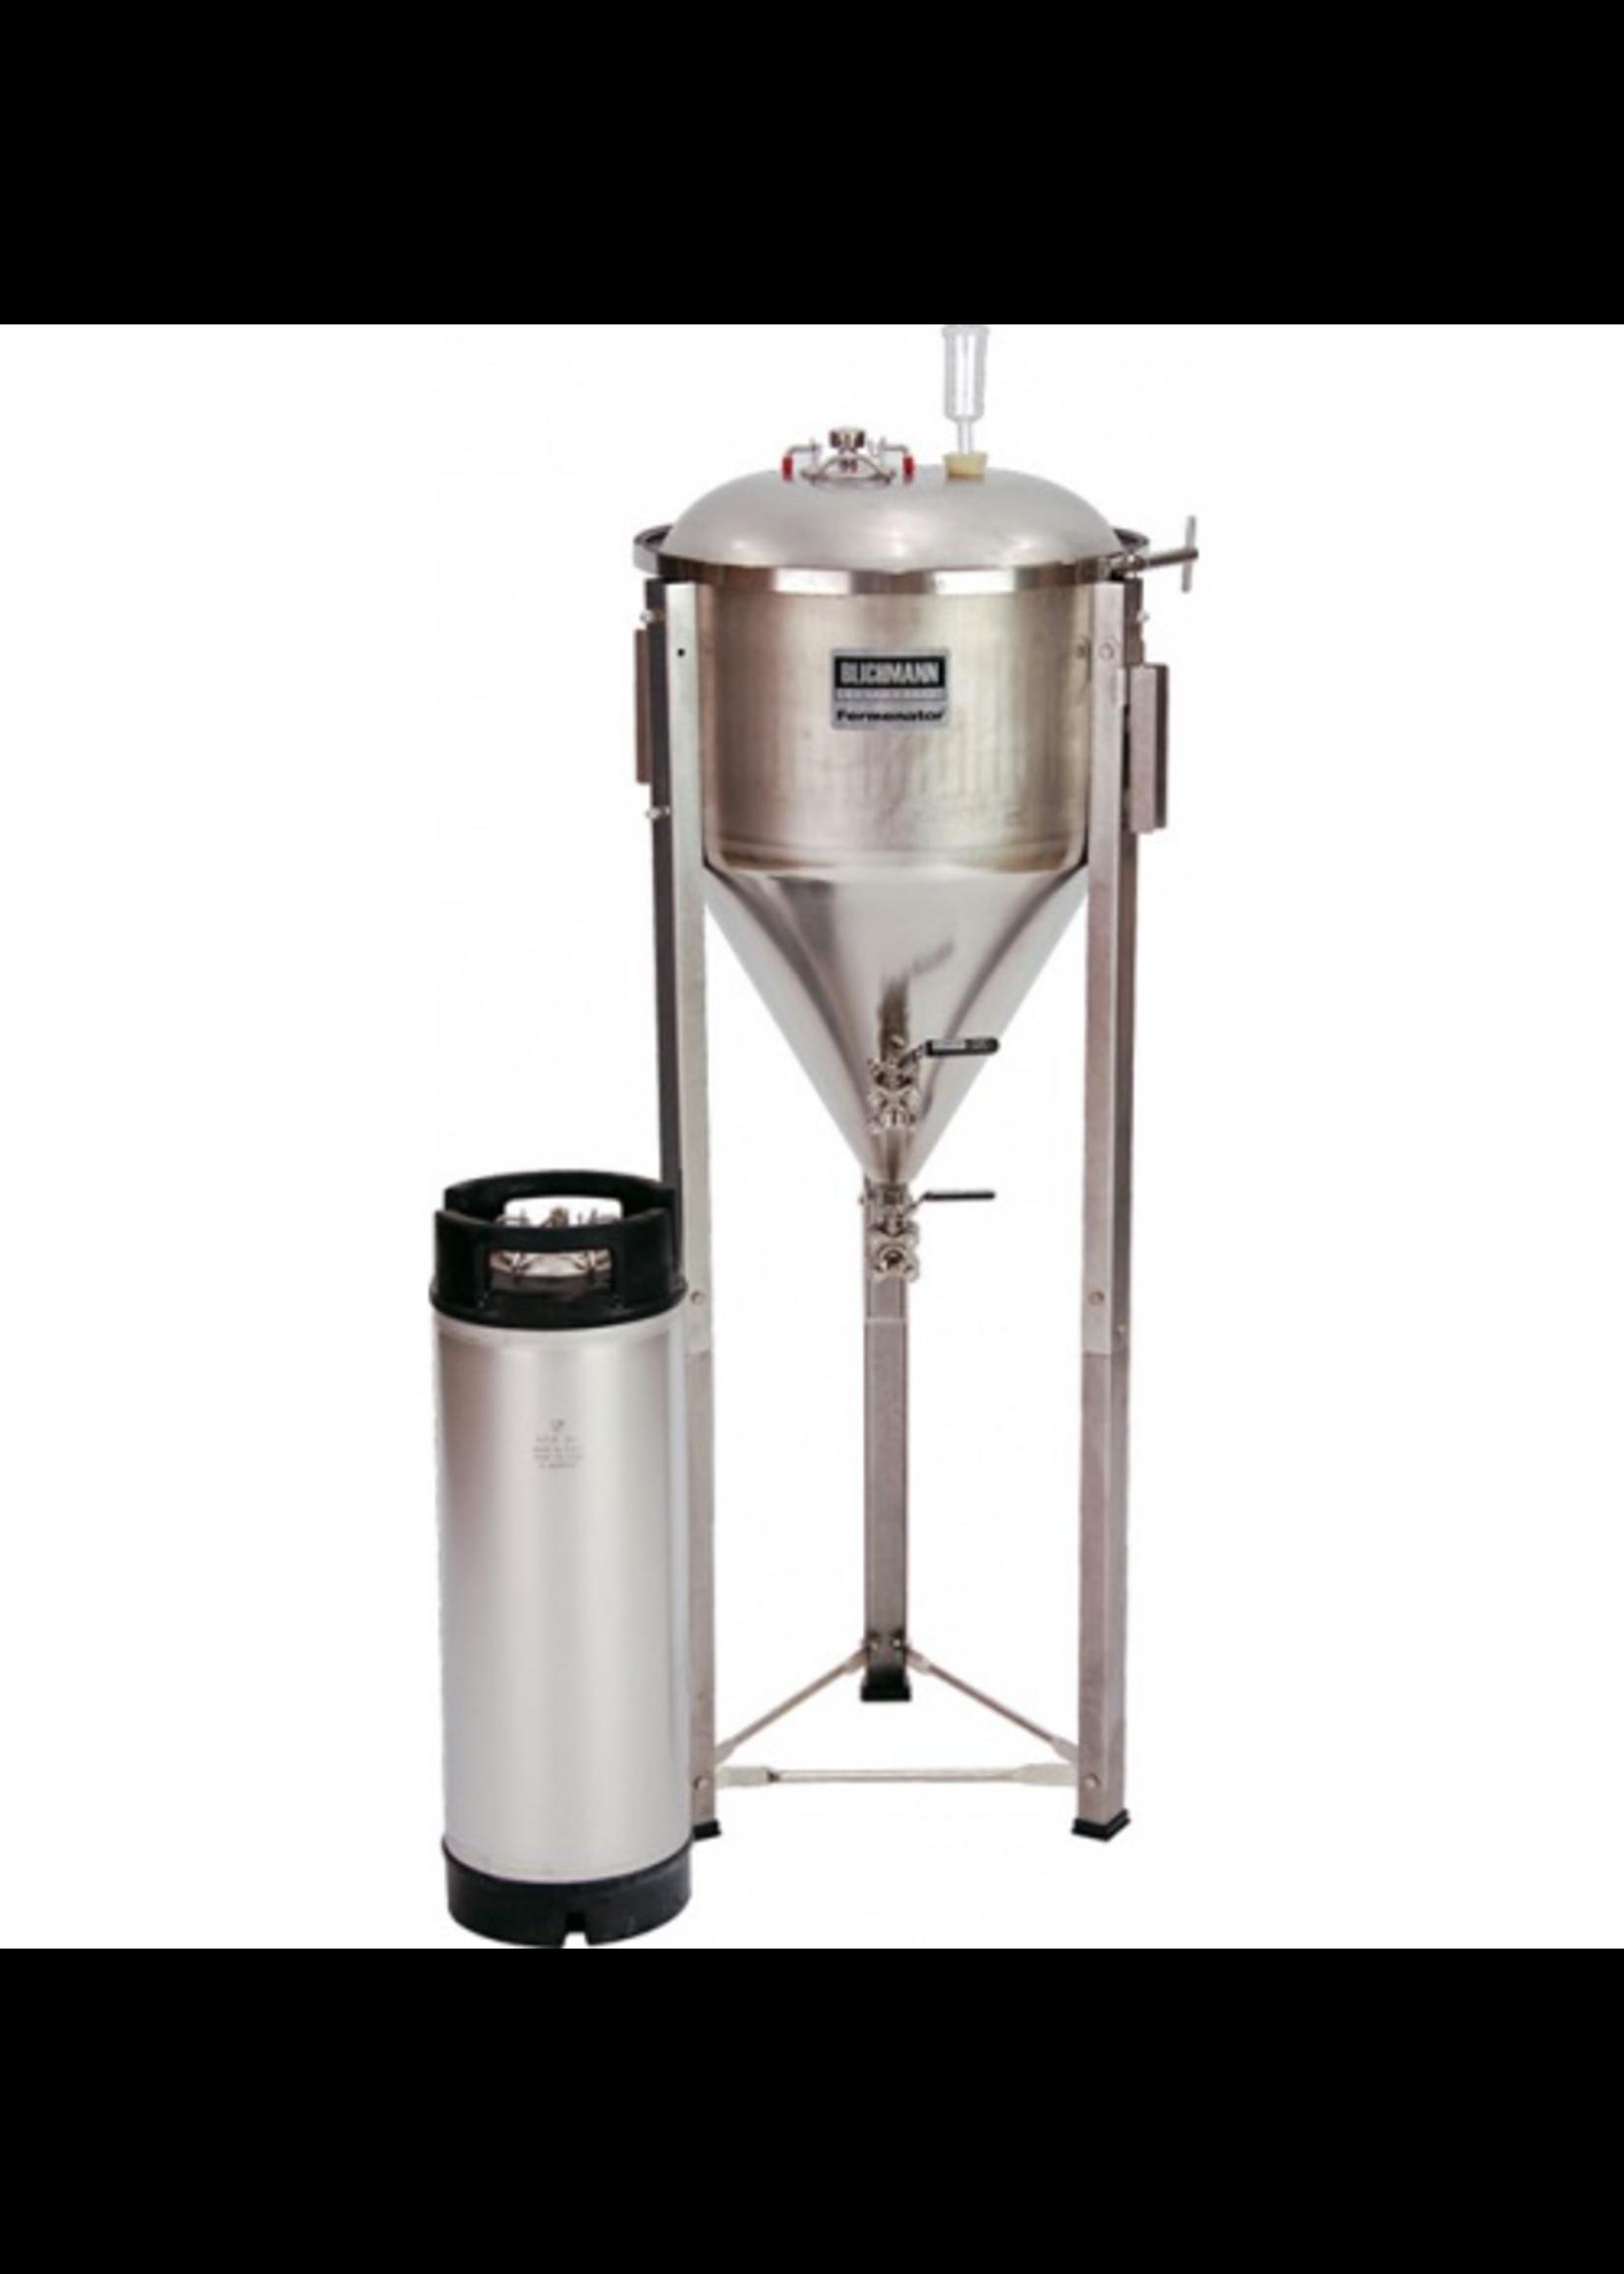 Blichmann Blichmann Fermenator - Leg Extensions for 14 Gallon Conical